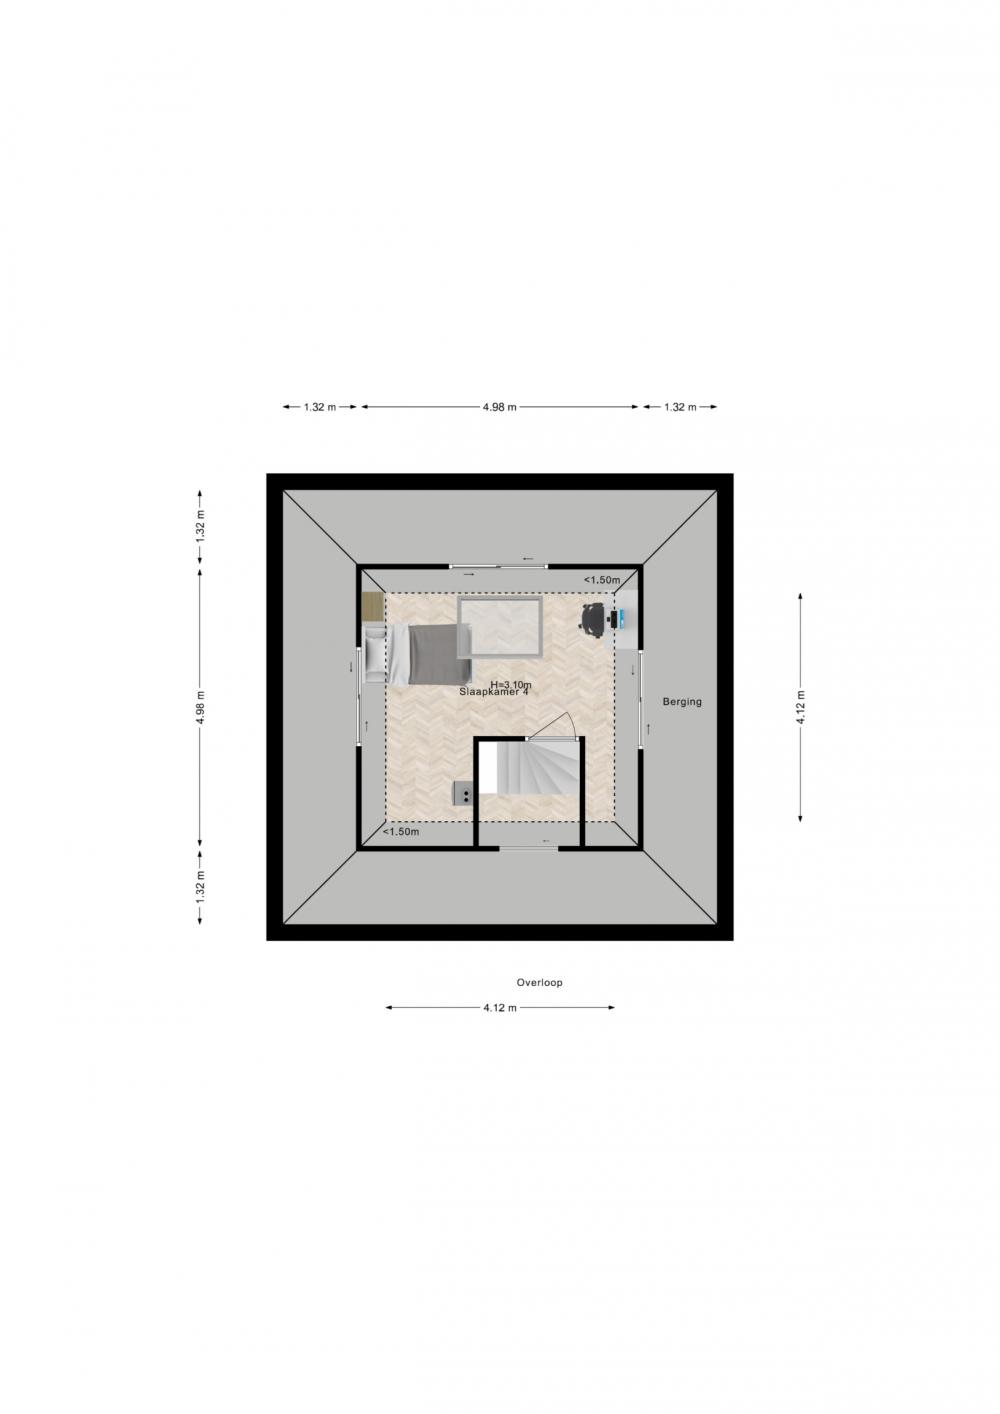 lochem-stellingmolenlaan-19